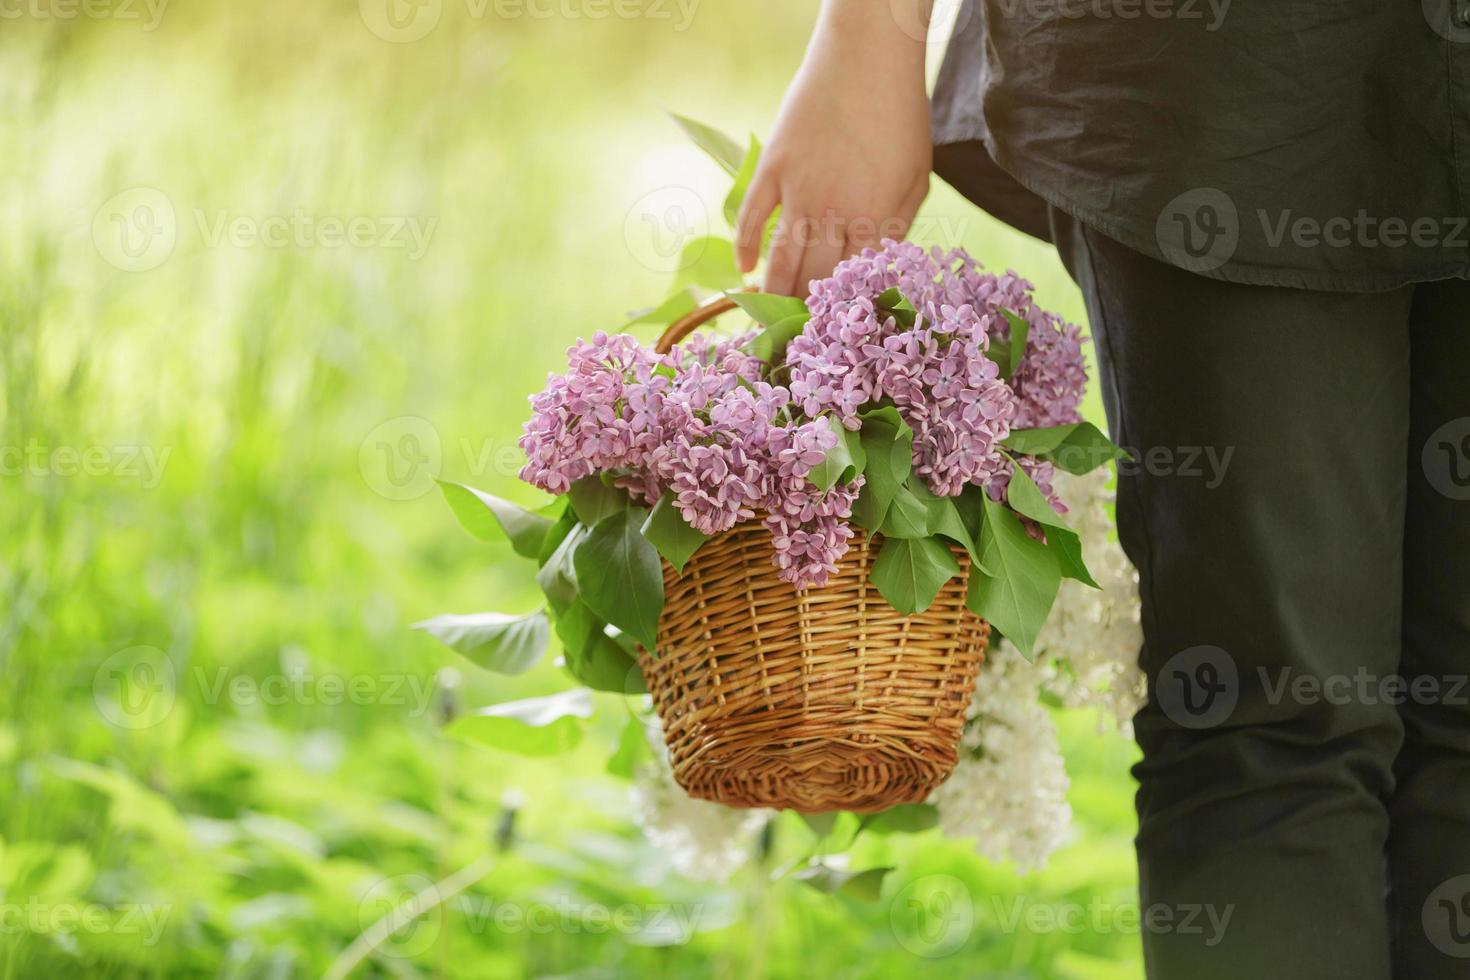 femelle, adolescente, tenir panier plein de fleurs lilas photo